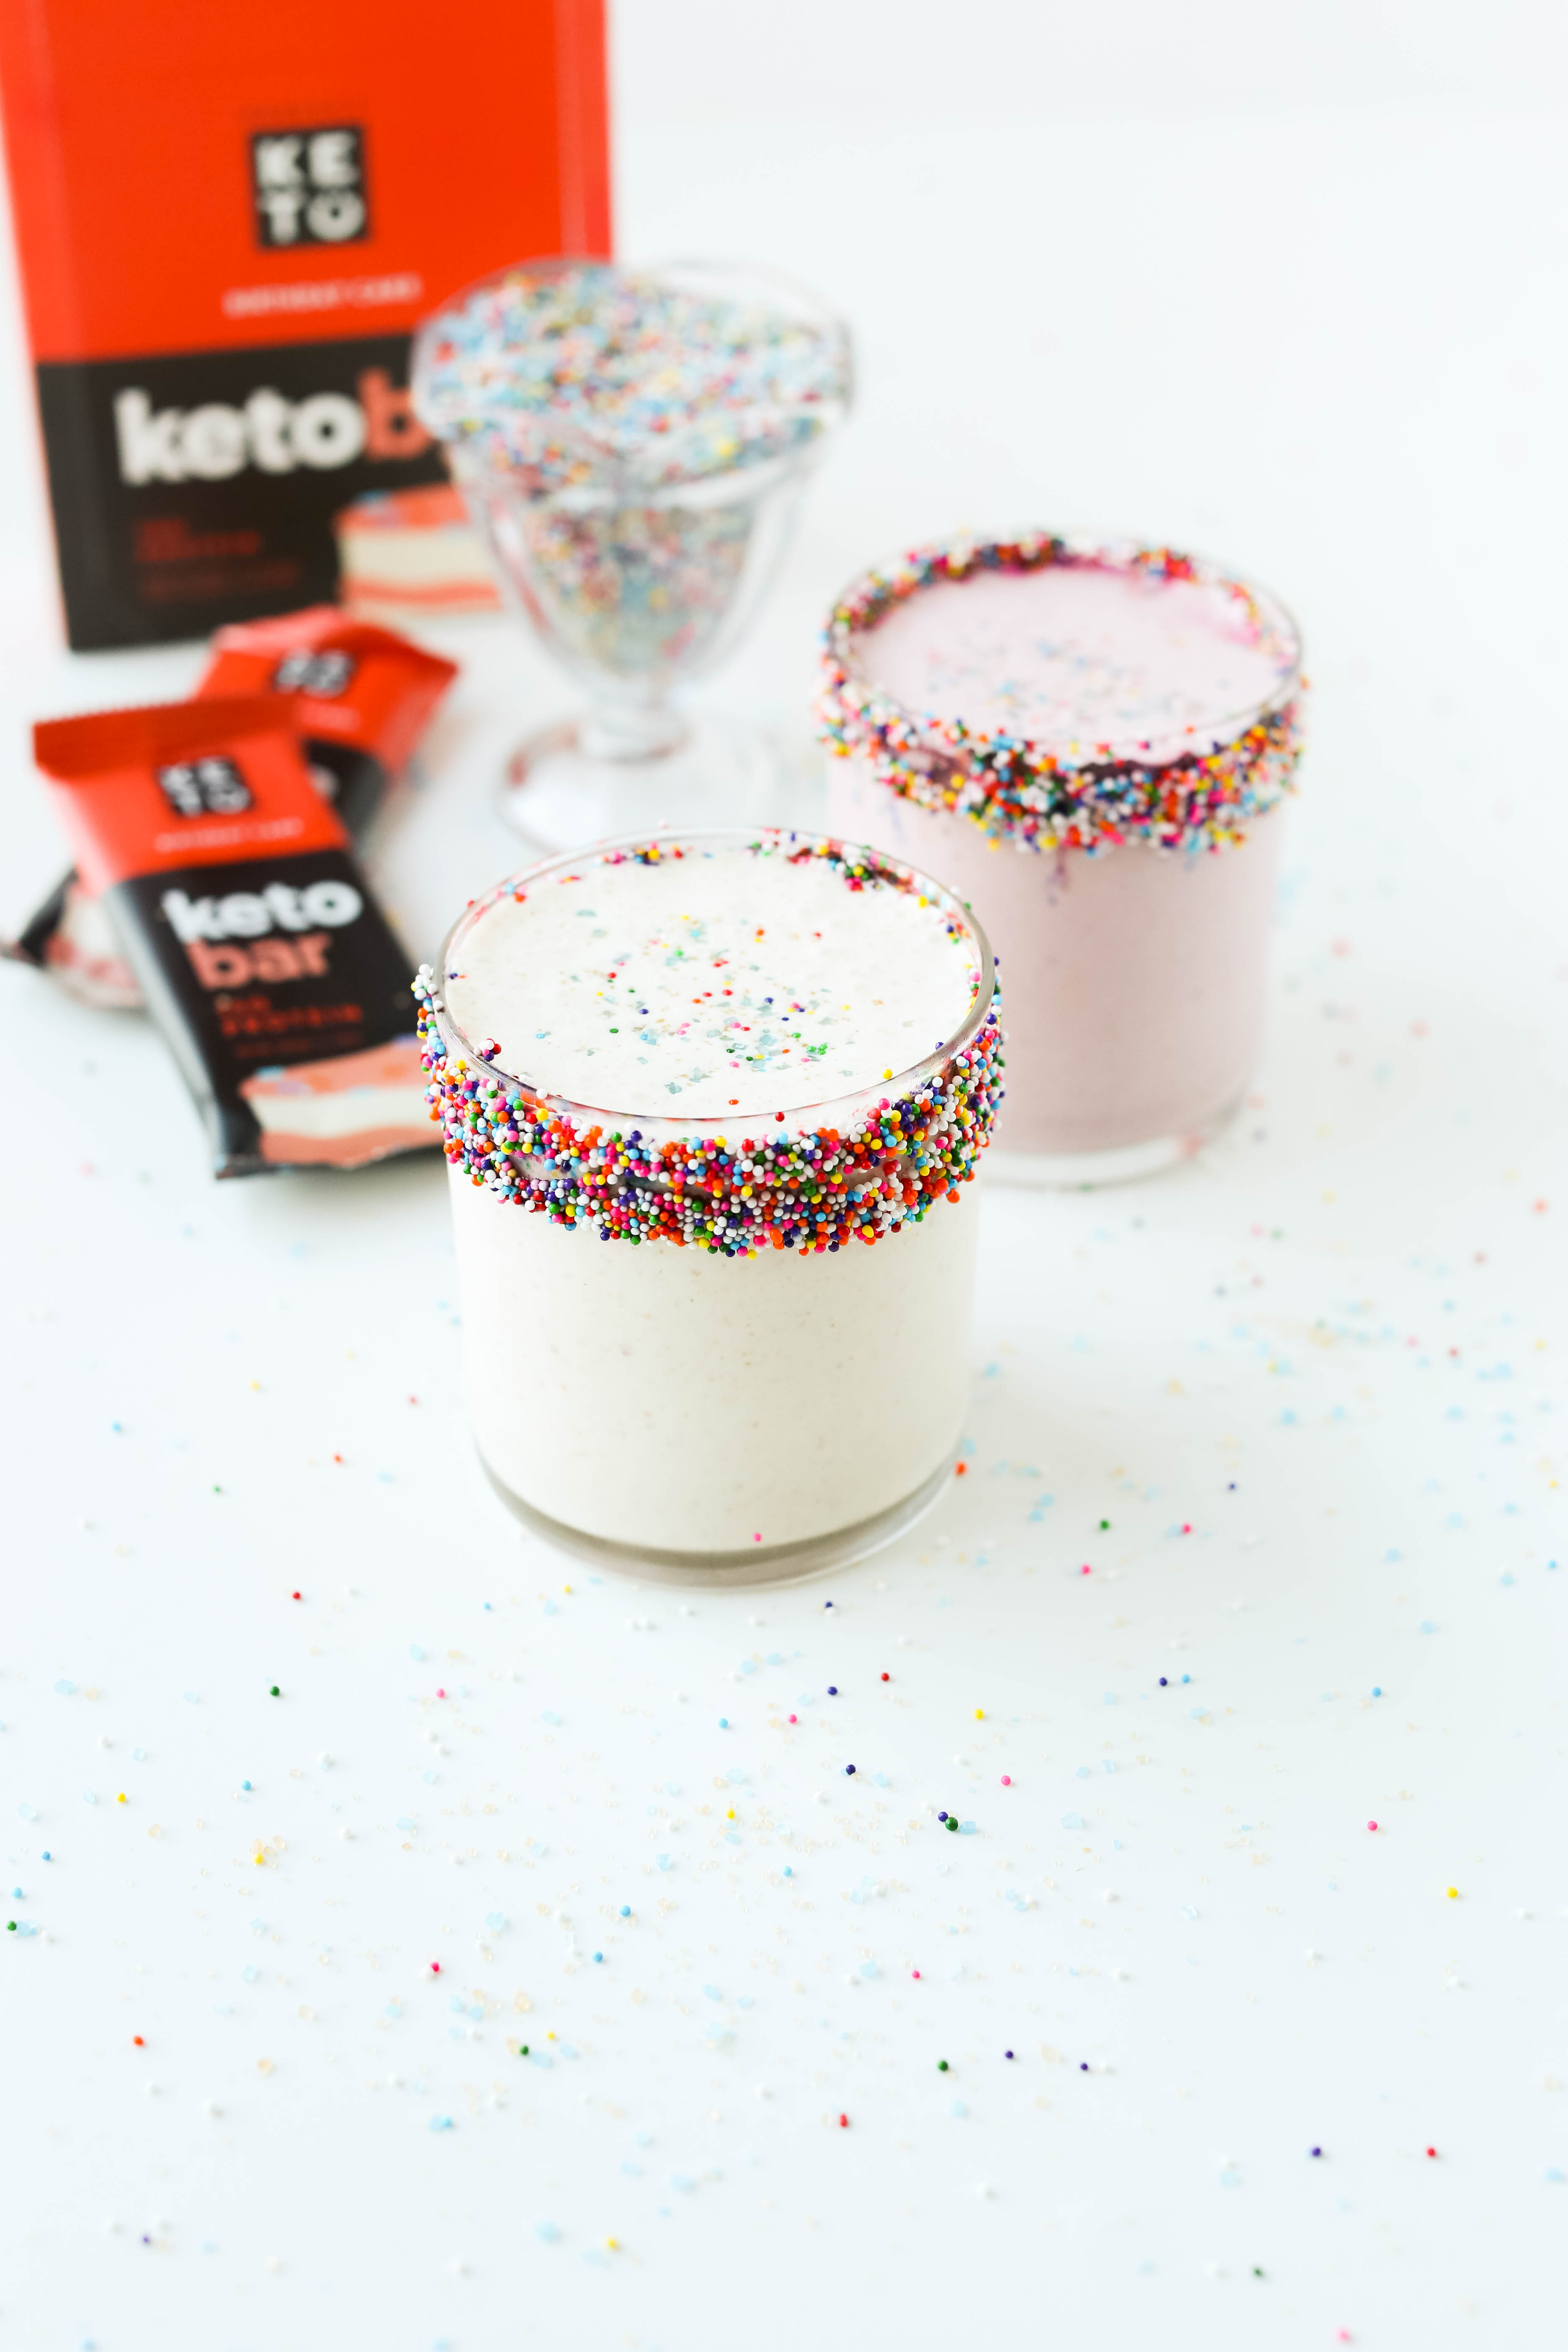 Wondrous Keto Birthday Cake Shake Perfect Keto Funny Birthday Cards Online Inifofree Goldxyz